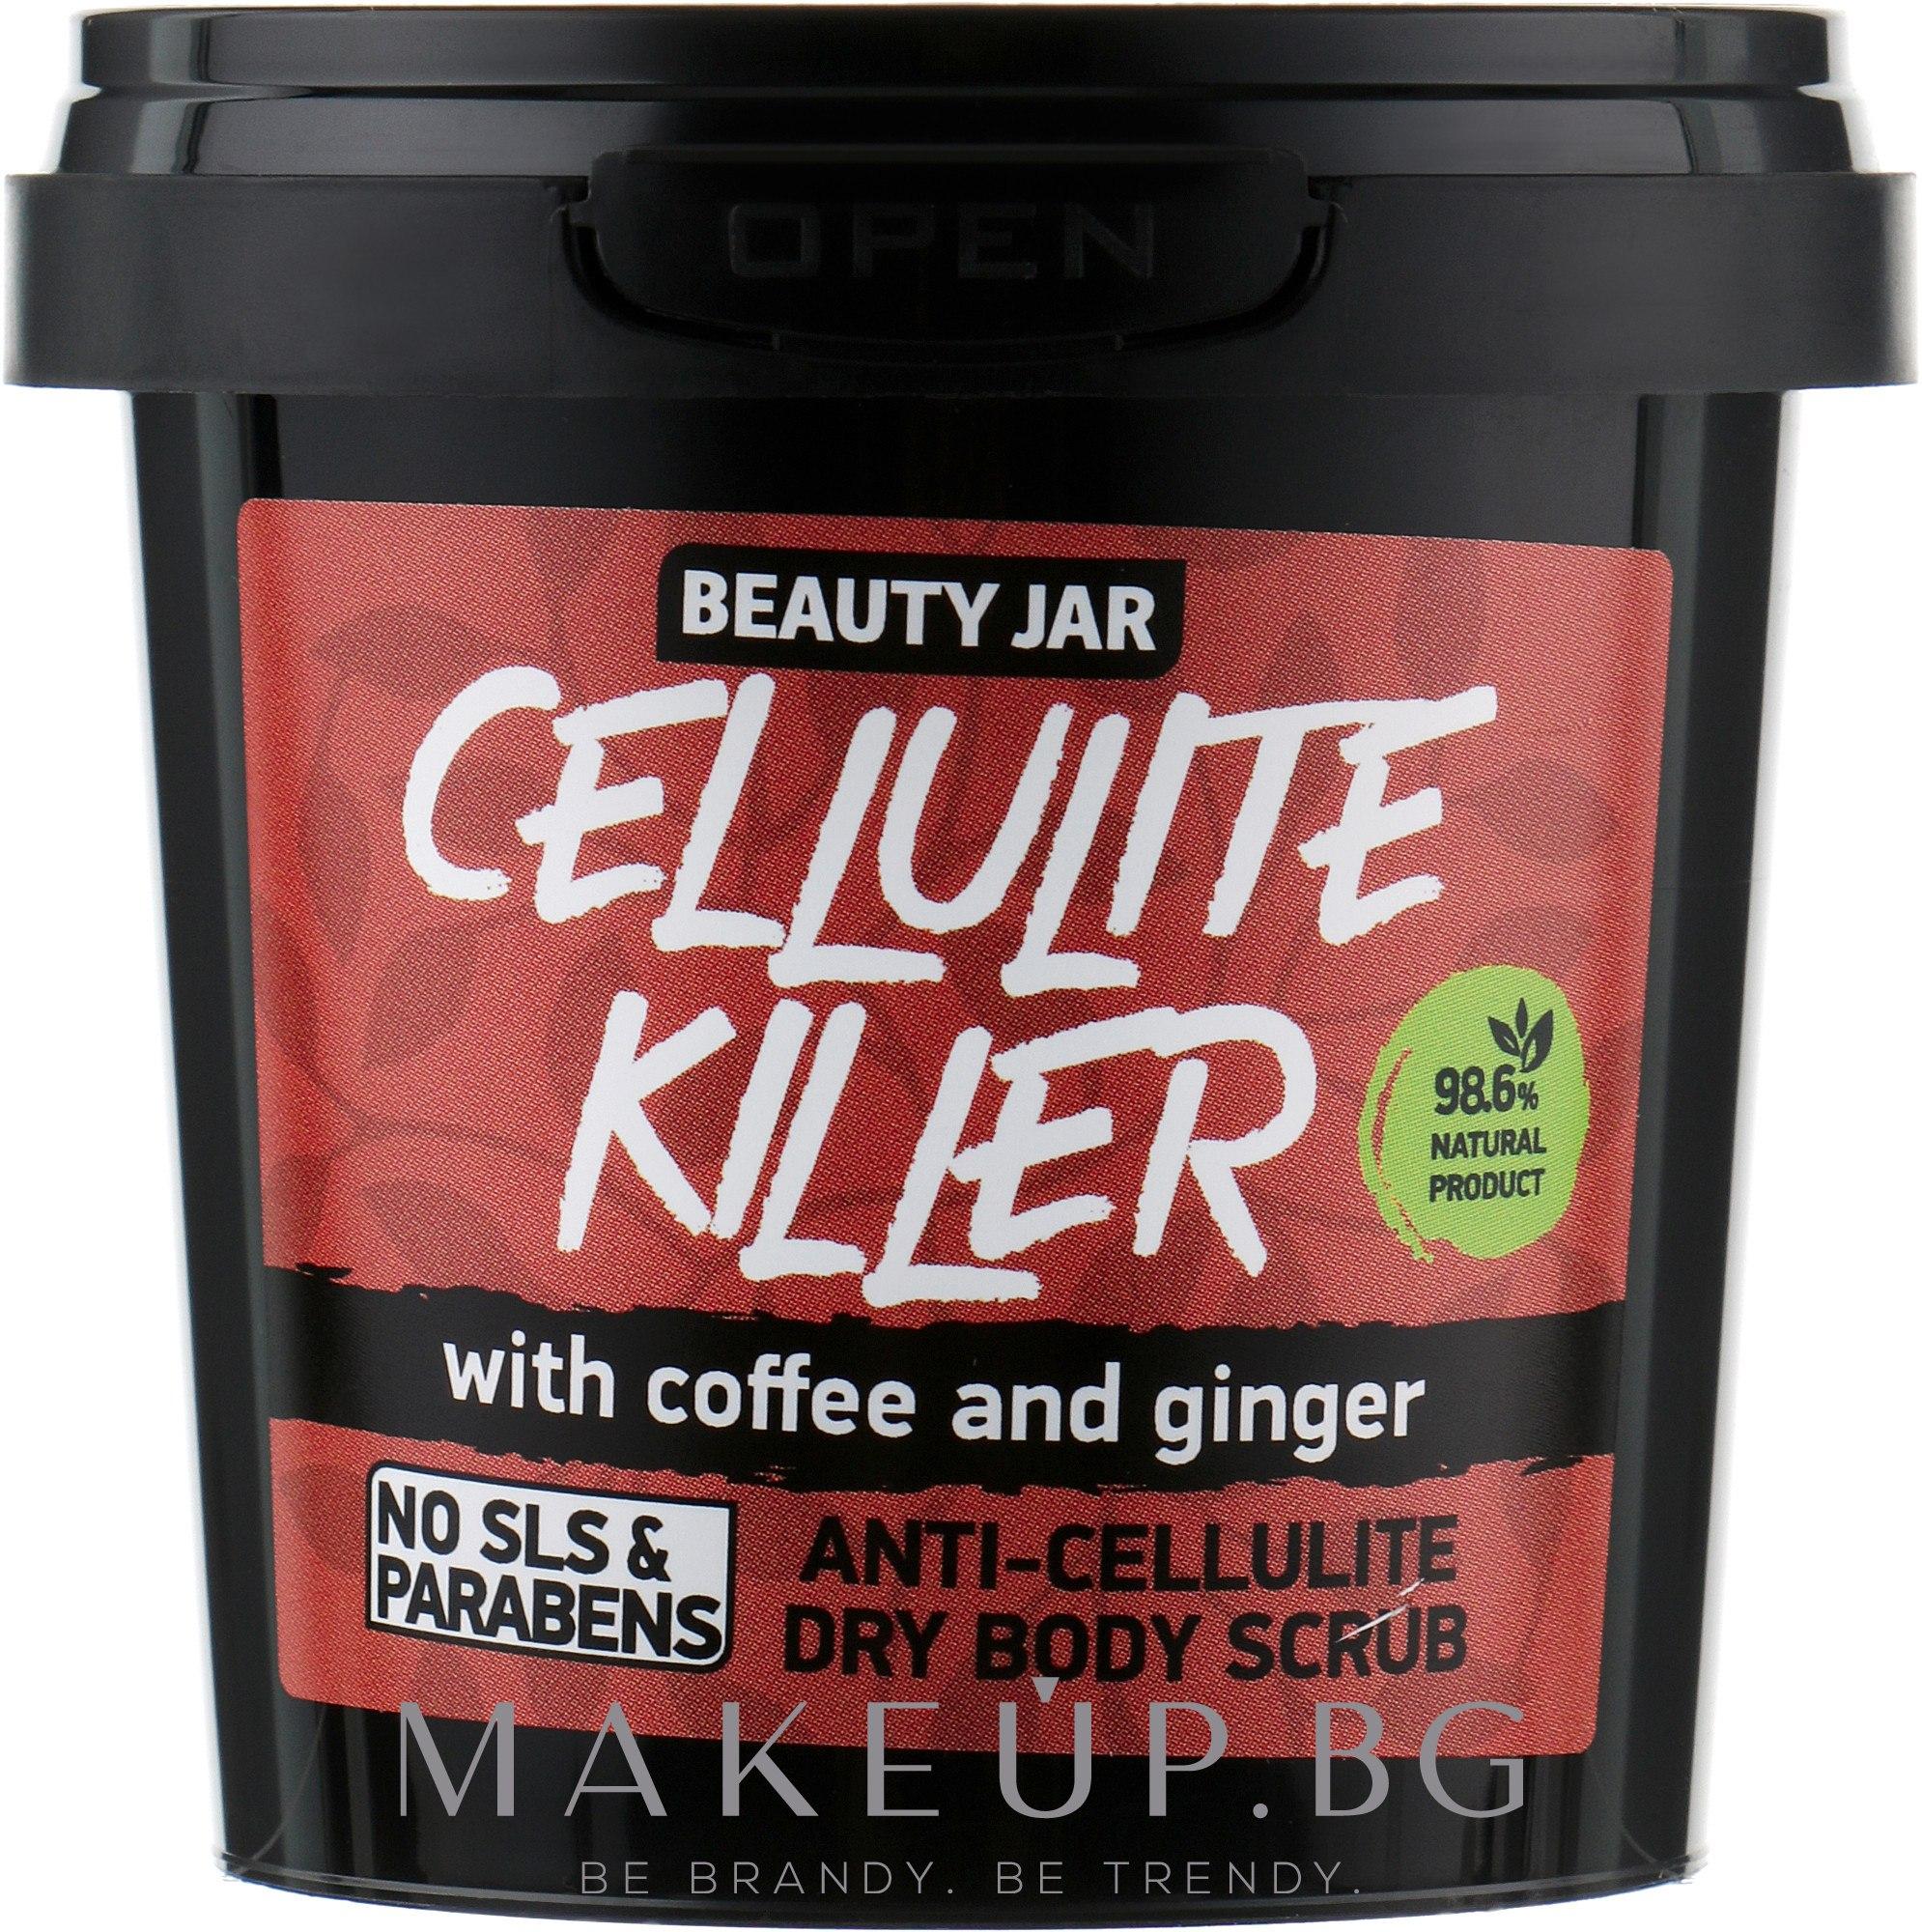 "Антицелулитен скраб за тяло ""Cellulite Killer"" - Beauty Jar Anti-Cellulite Dry Body Scrub — снимка 150 g"